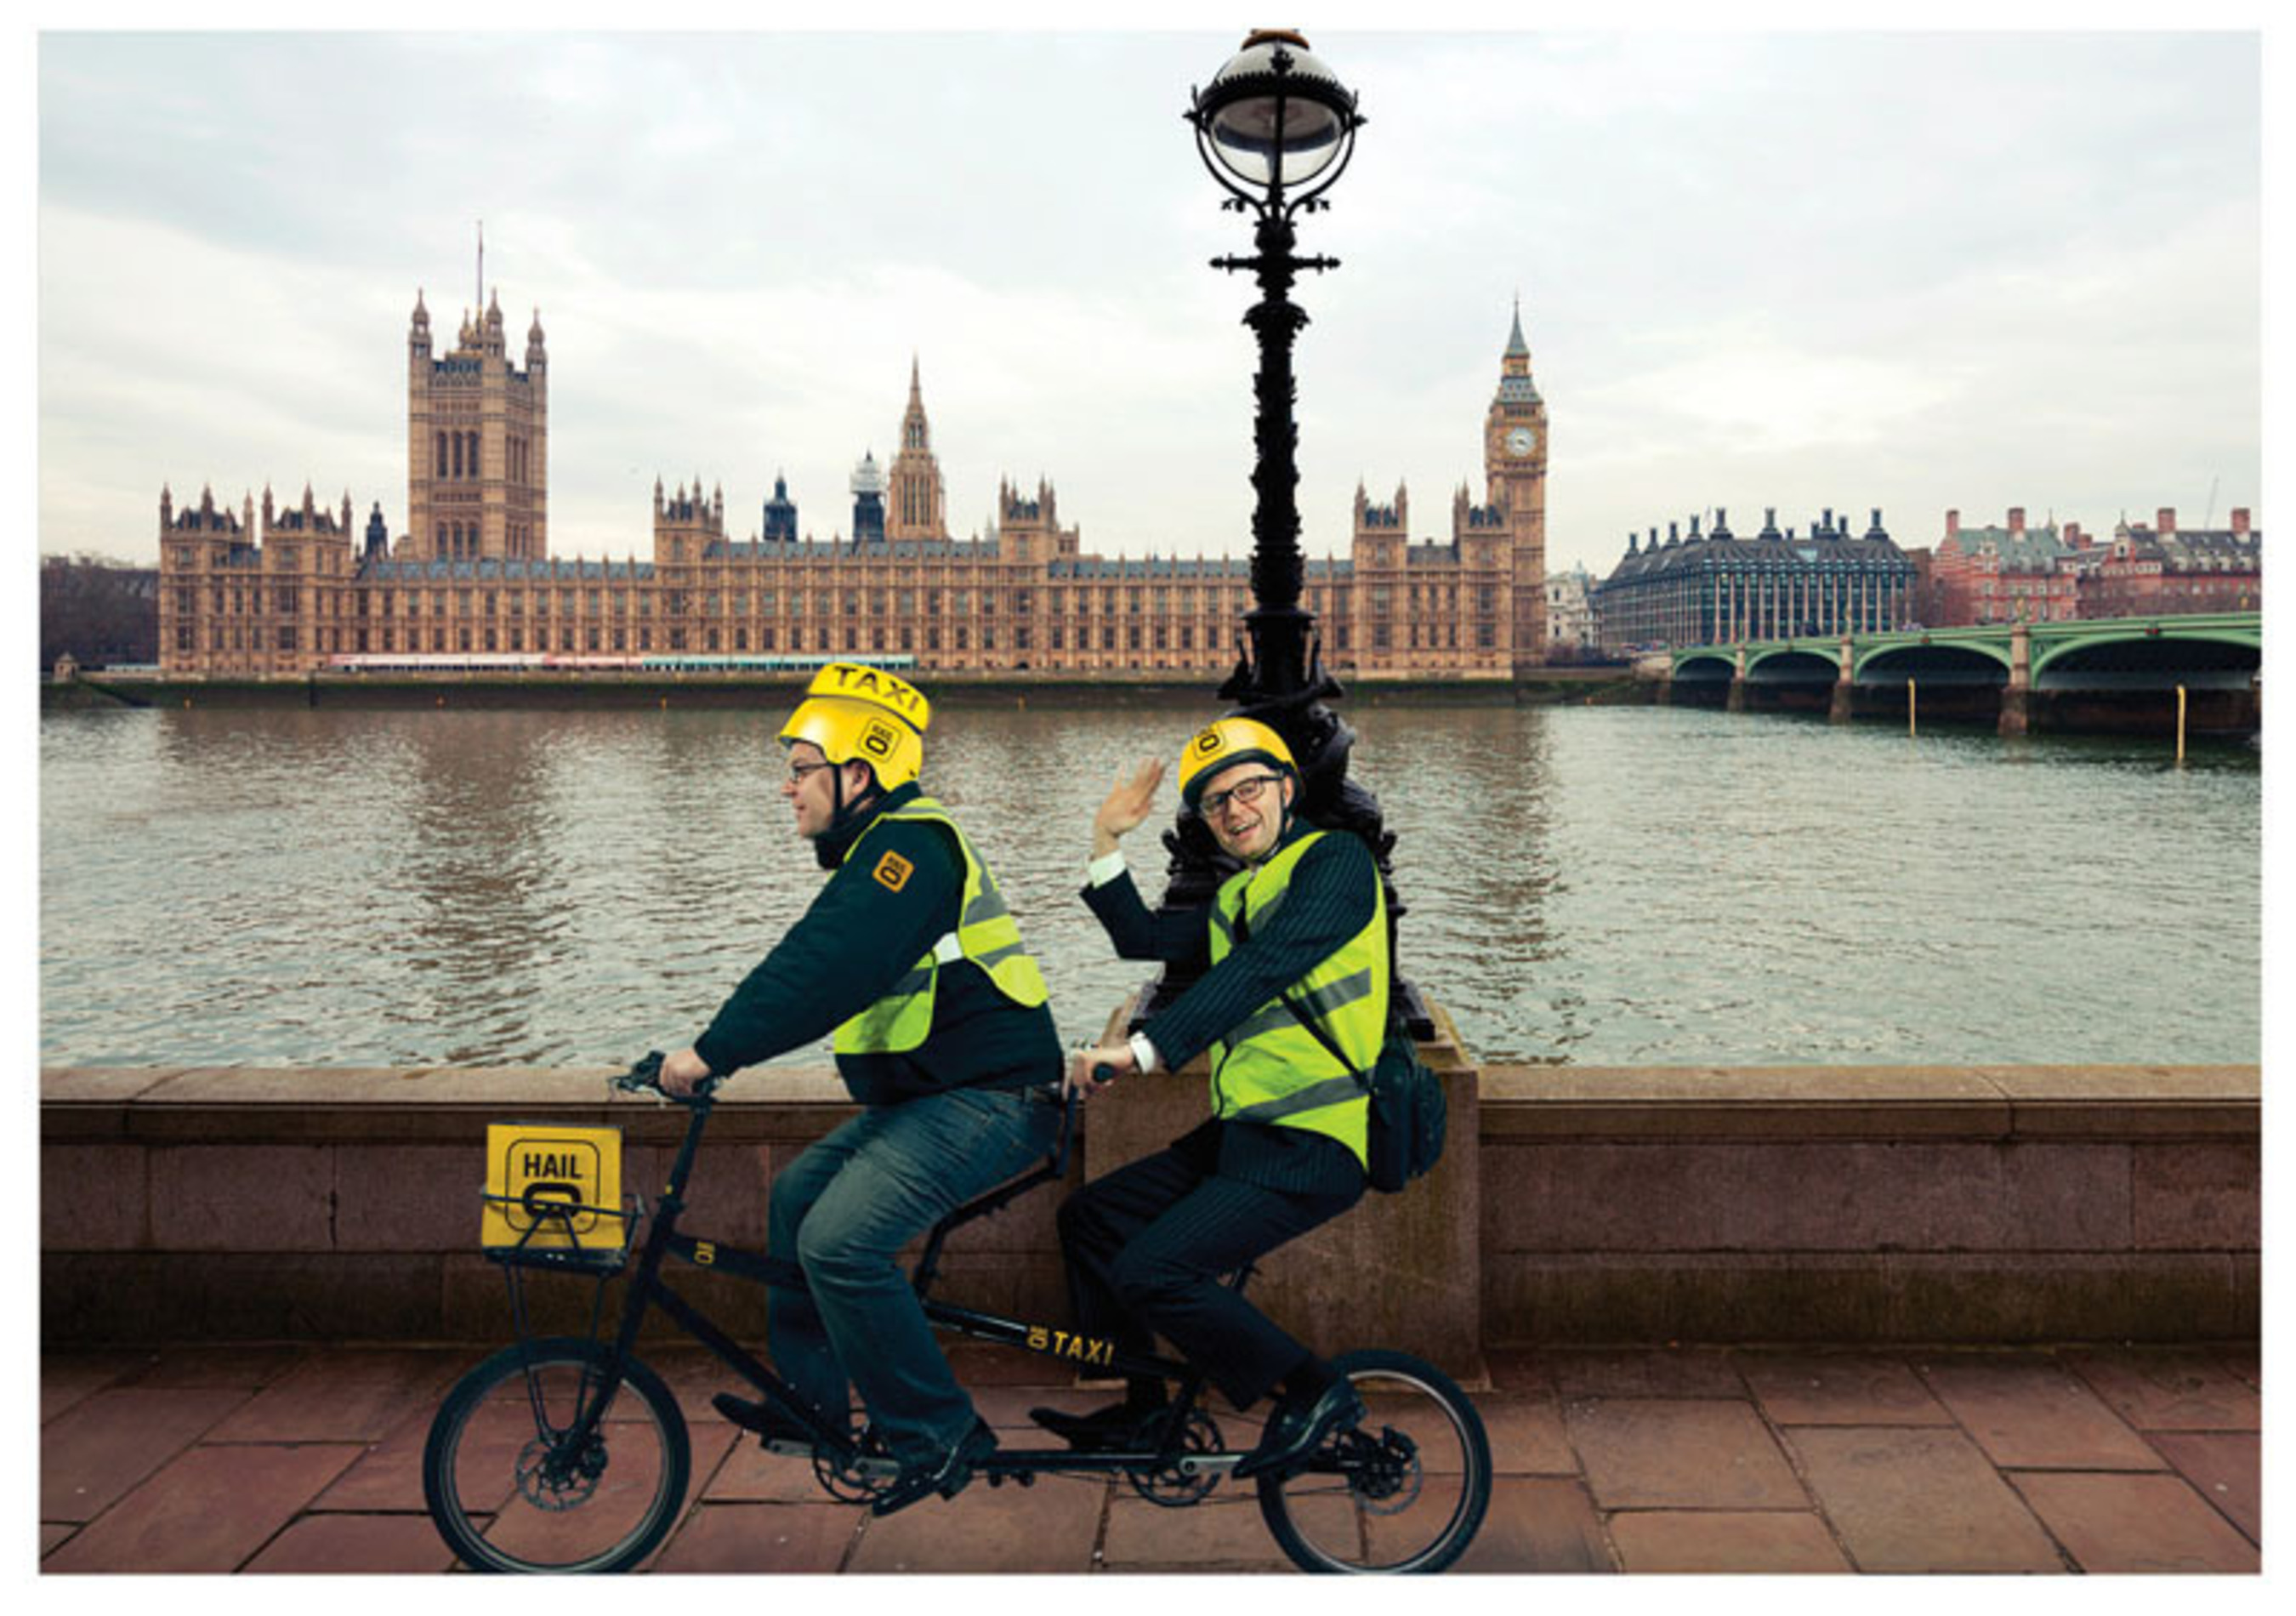 Hailo, the taxi app, introduces innovative Tandem Taxi Bike service. (PRNewsFoto/Hailo) (PRNewsFoto/HAILO)